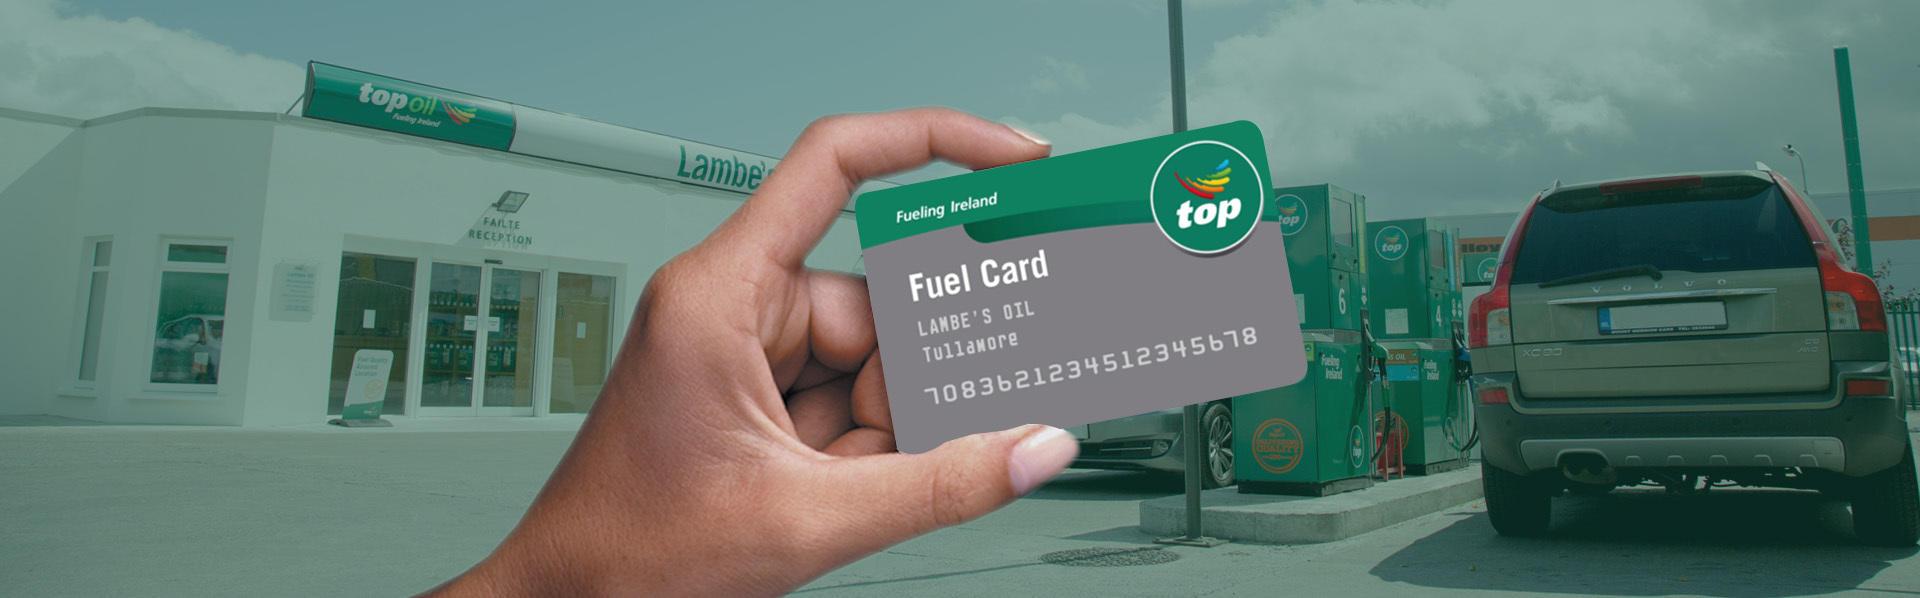 Lambes Oil Fuel Card